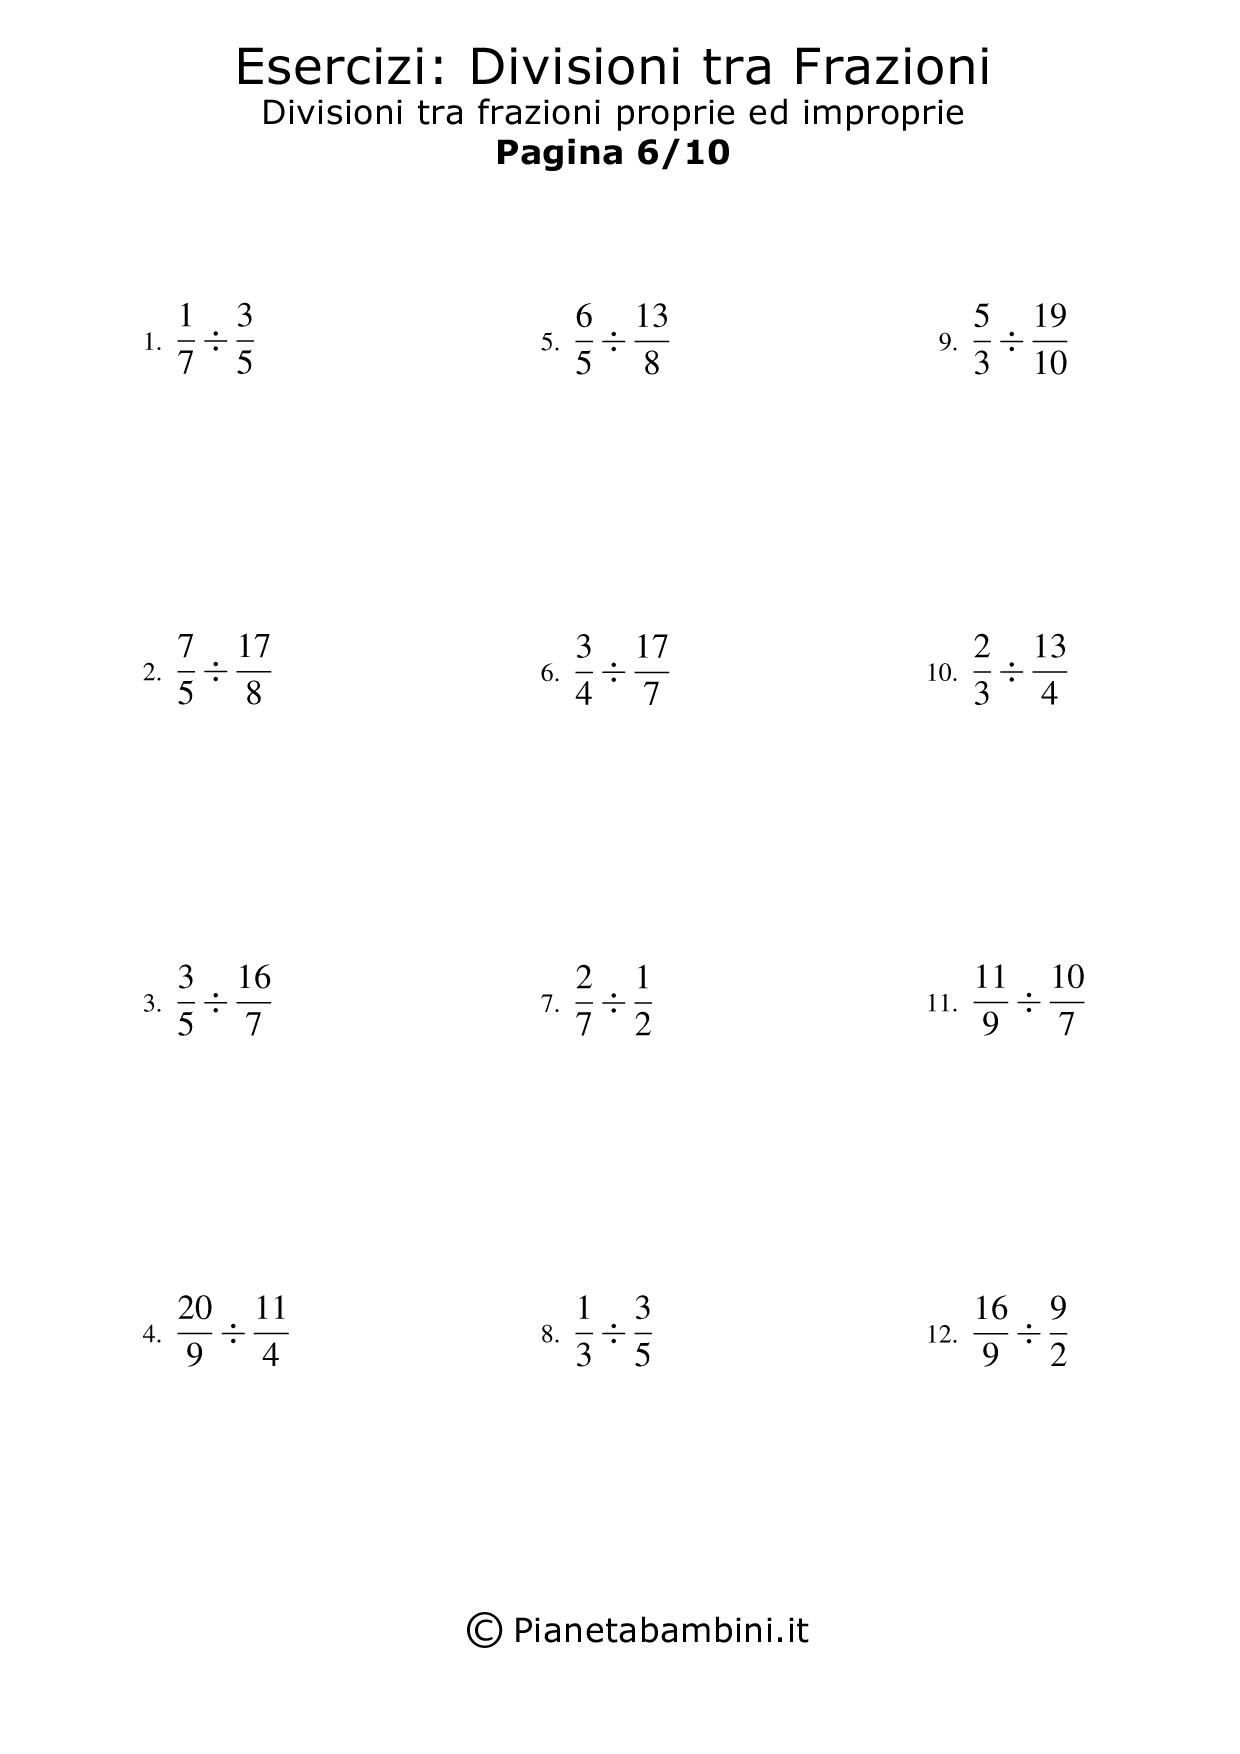 Esercizi-Divisioni-Frazioni-Proprie-Improprie_06